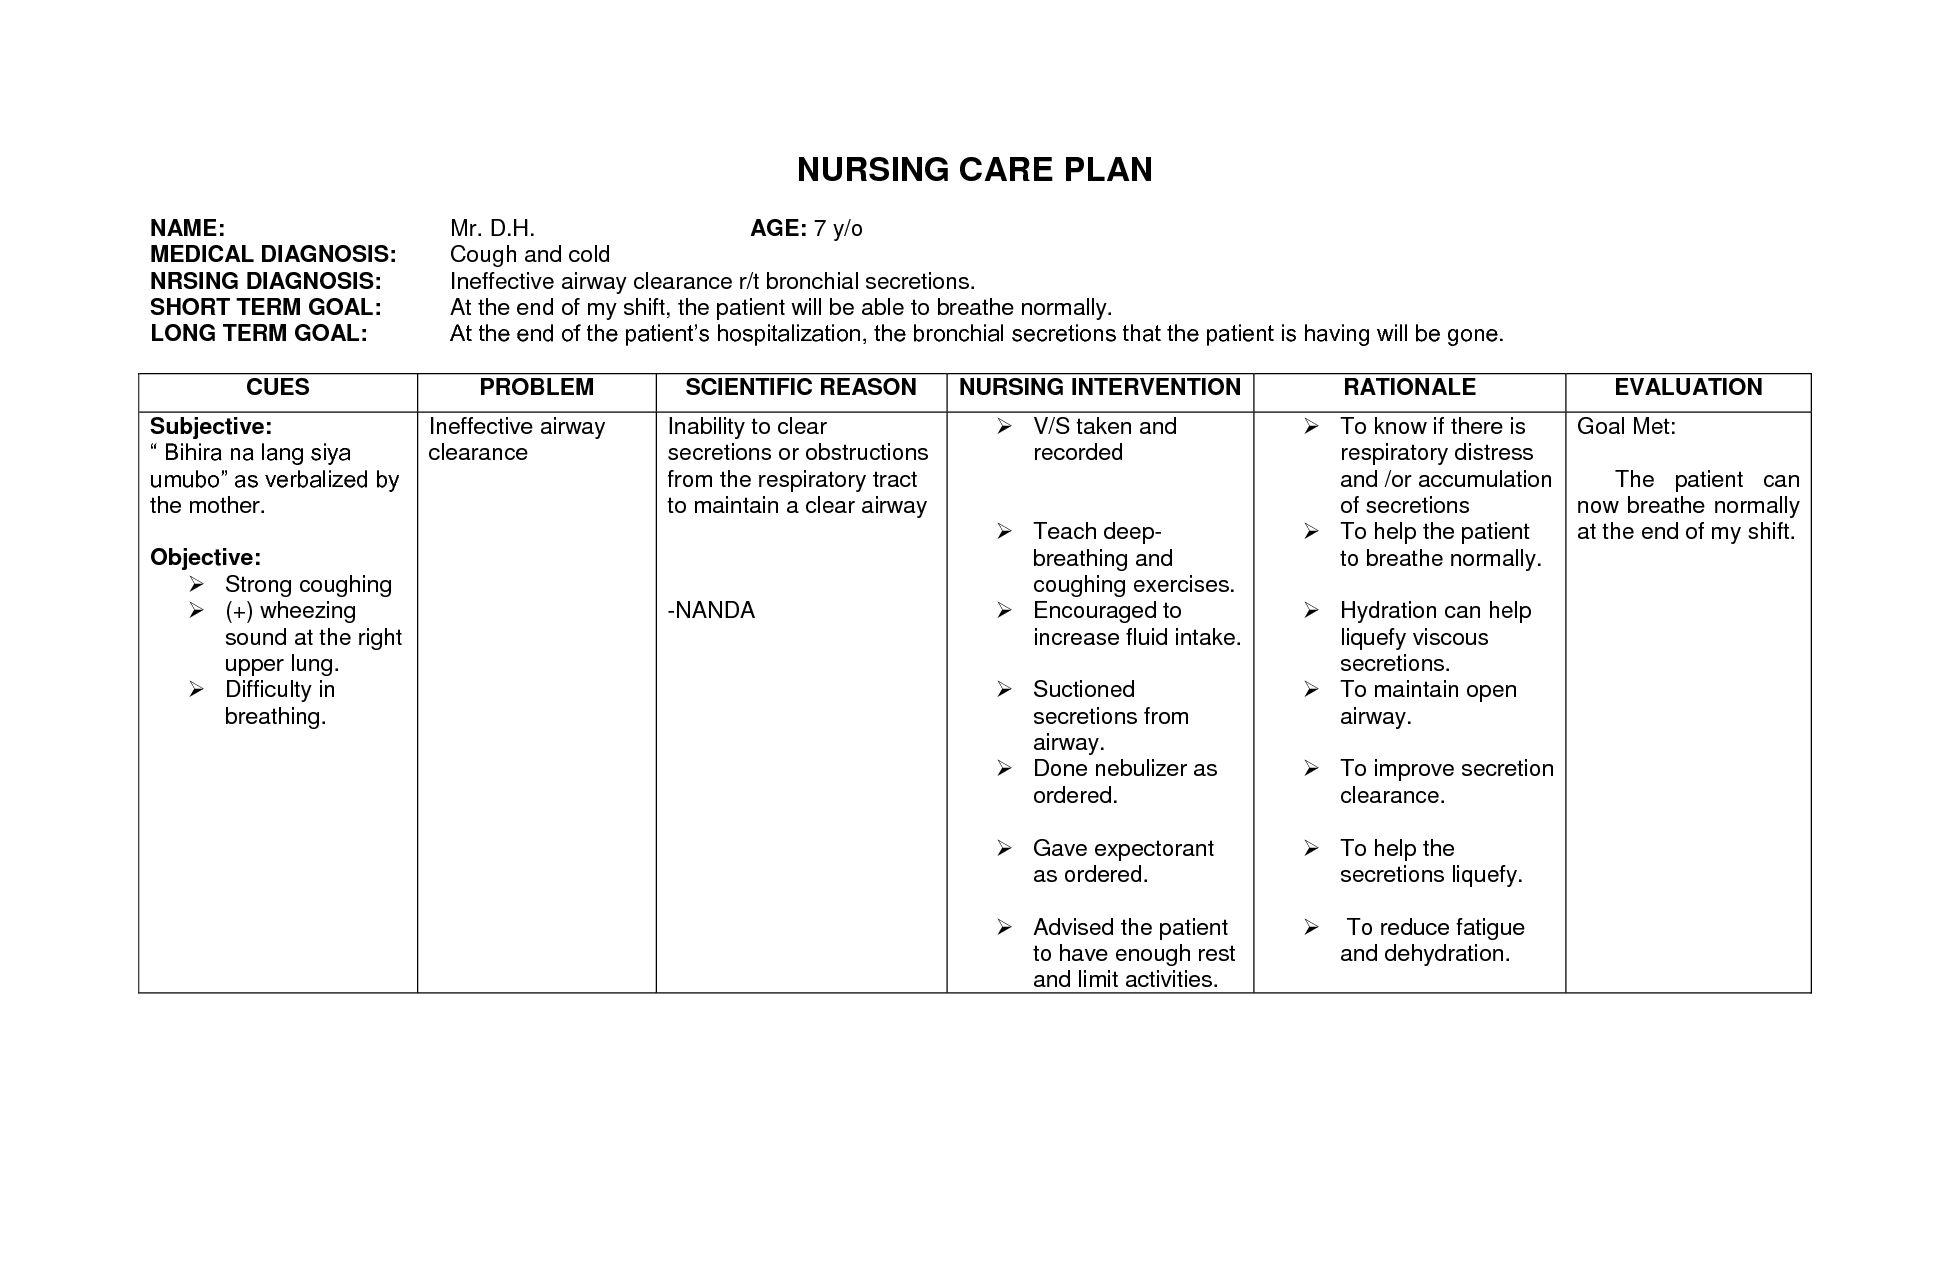 Blank Nursing Care Plan Templates Google Search Nursing Regarding Nursing Care Plan Template Wor Nursing Care Plan Nursing Care Plans Template Nursing Care